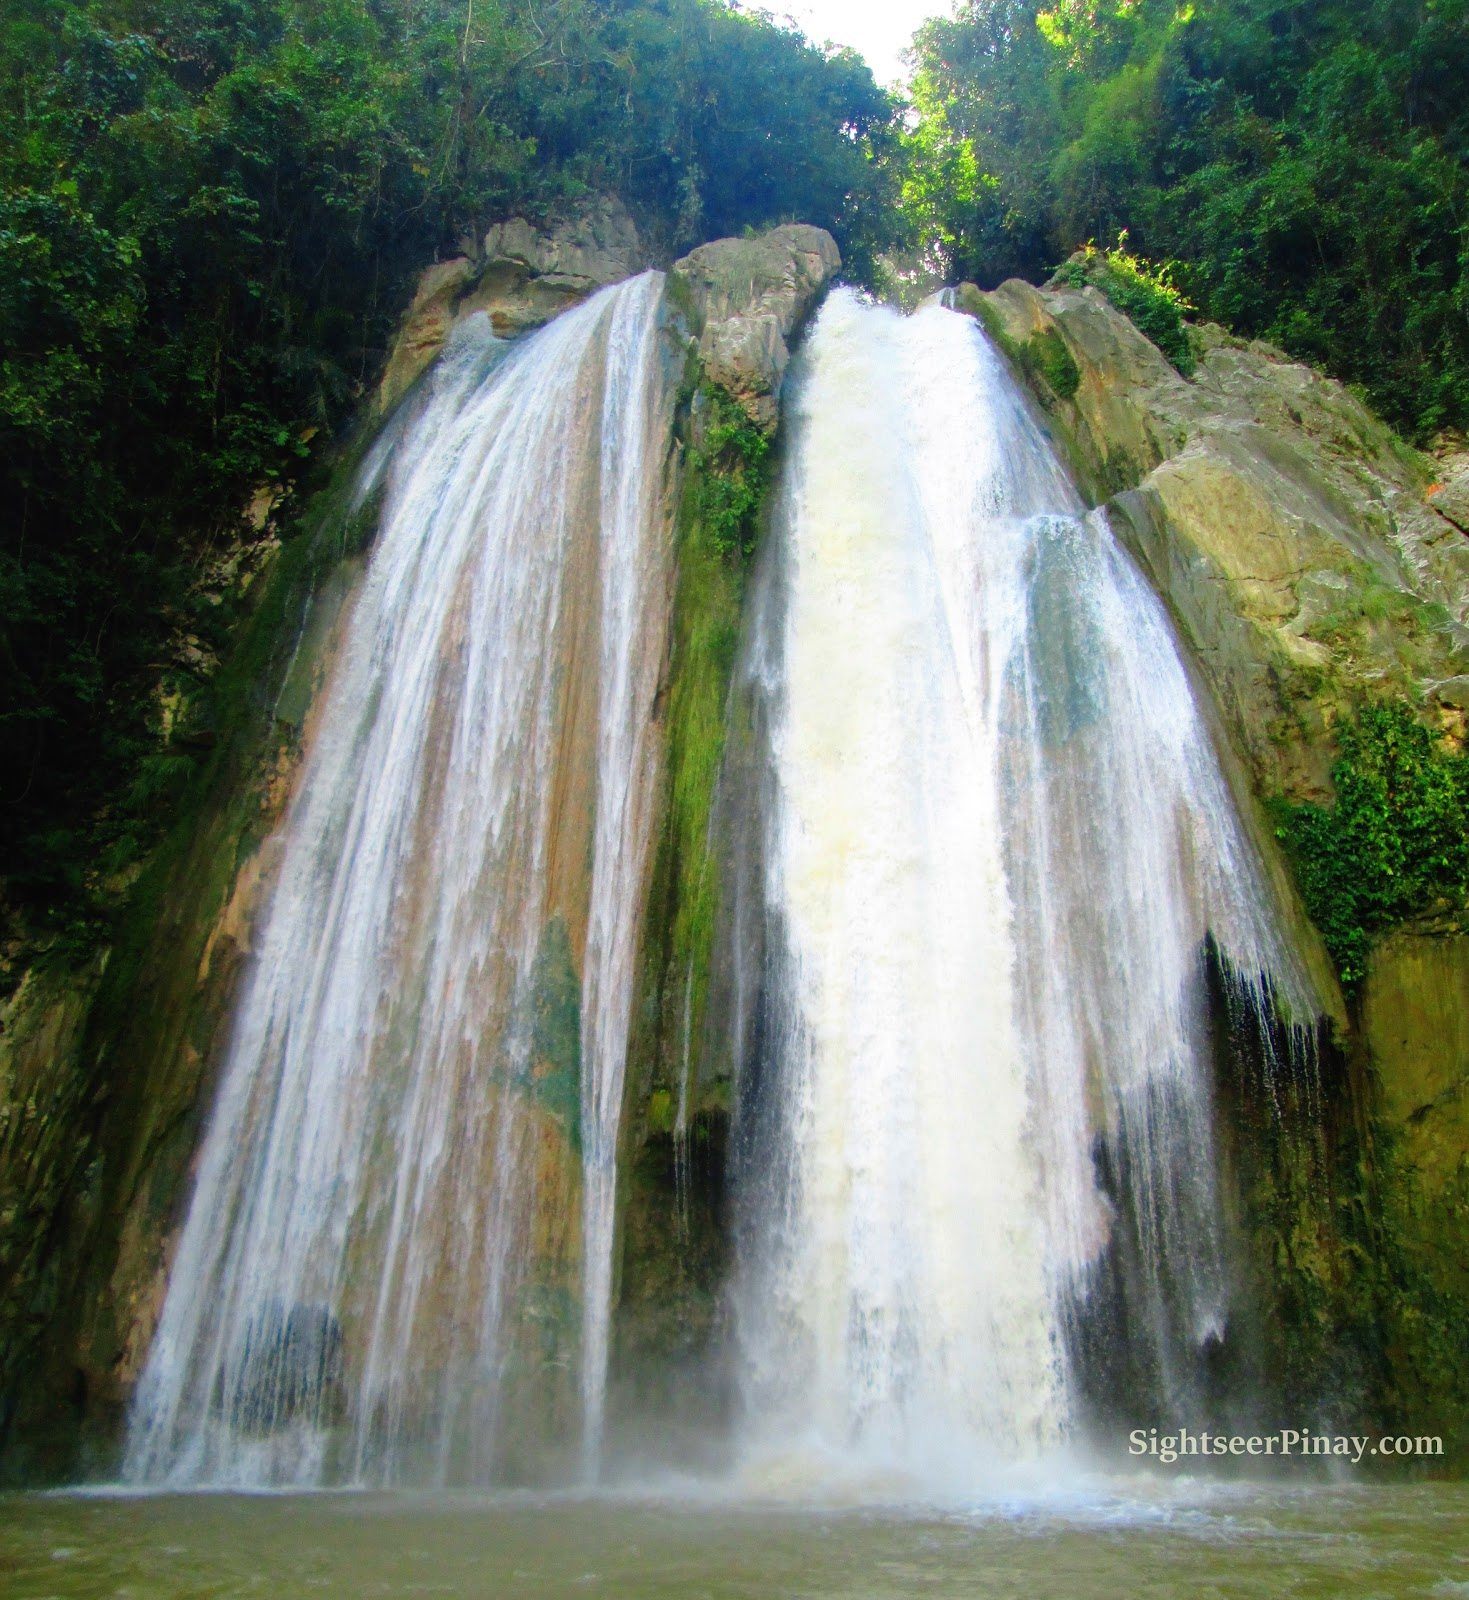 Visiting Dodiongan Falls, Iligan City